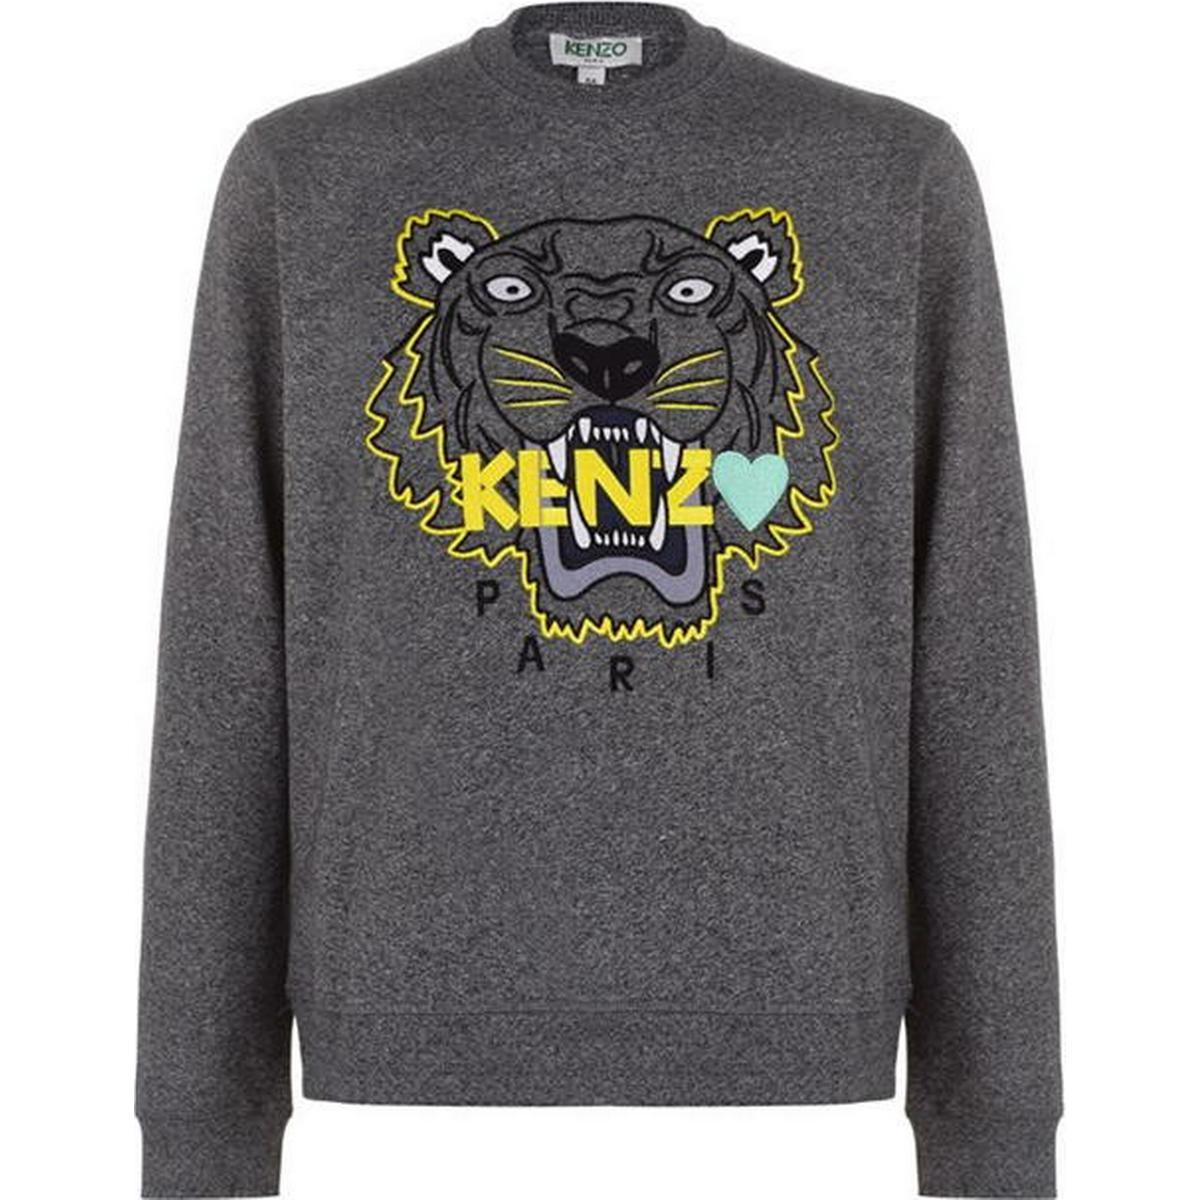 Green Tiger head motif sweatshirt  Kenzo  Tröjor